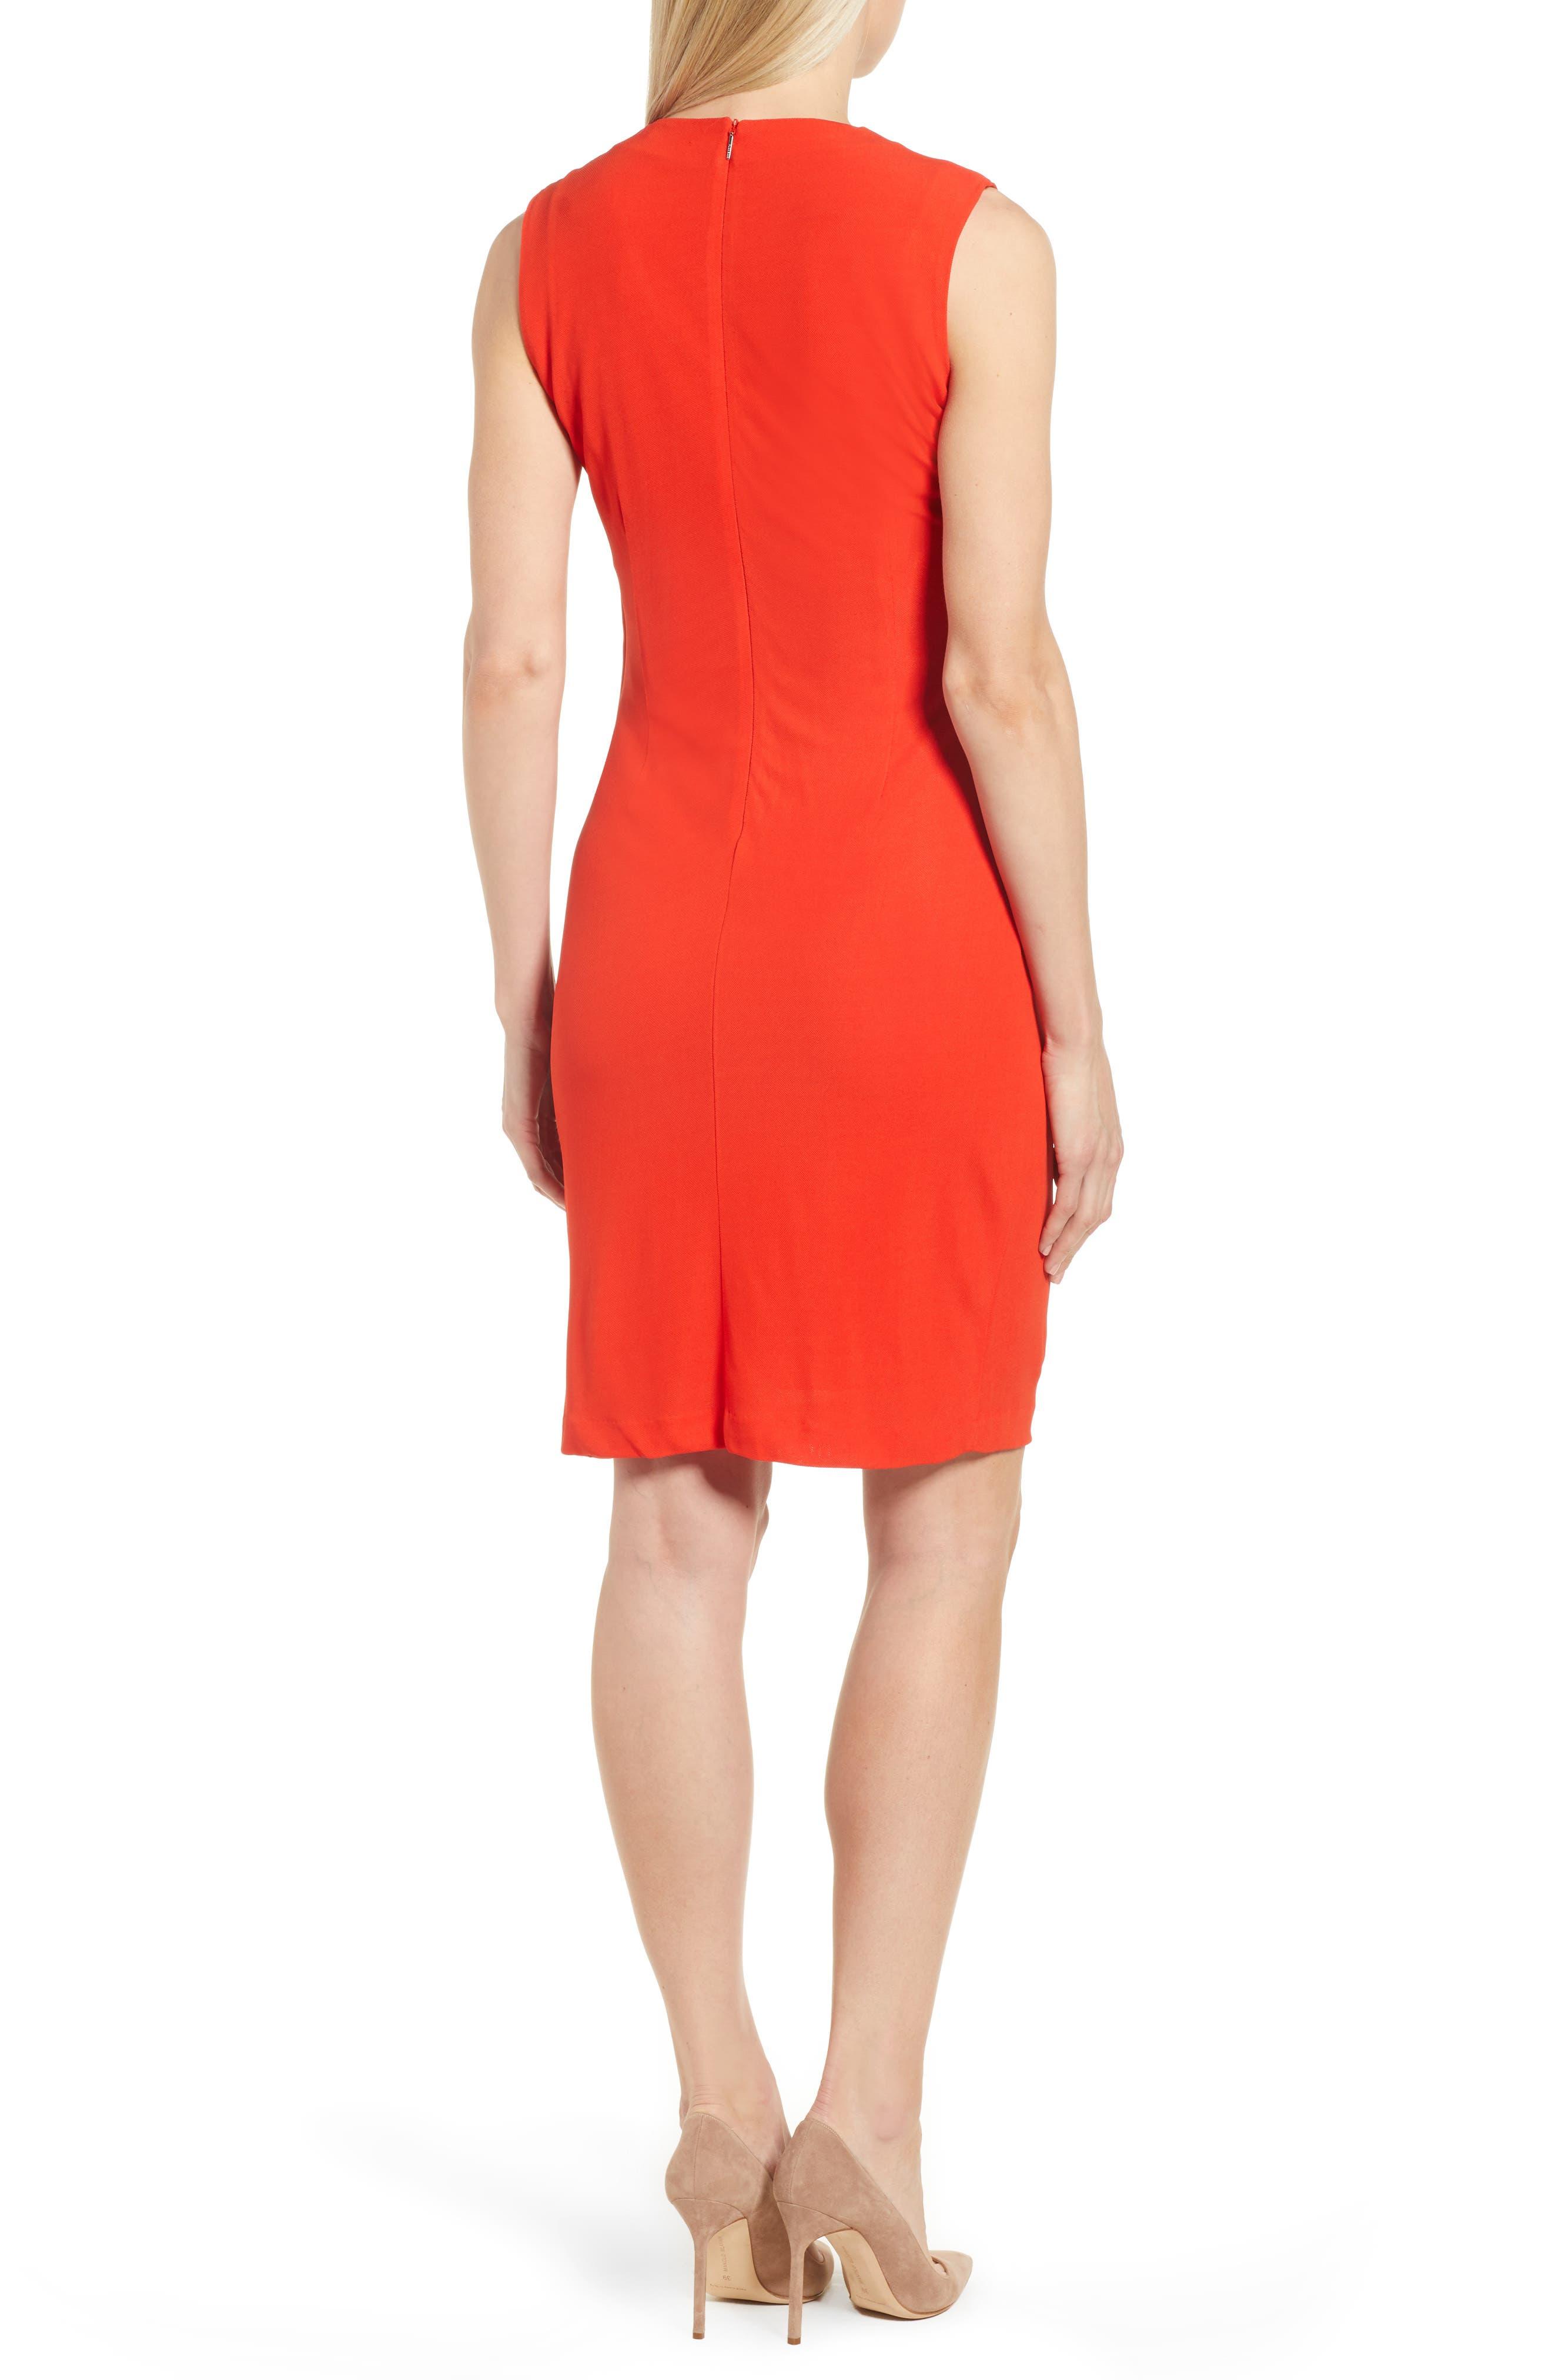 Erela Ruched Sheath Dress,                             Alternate thumbnail 2, color,                             824